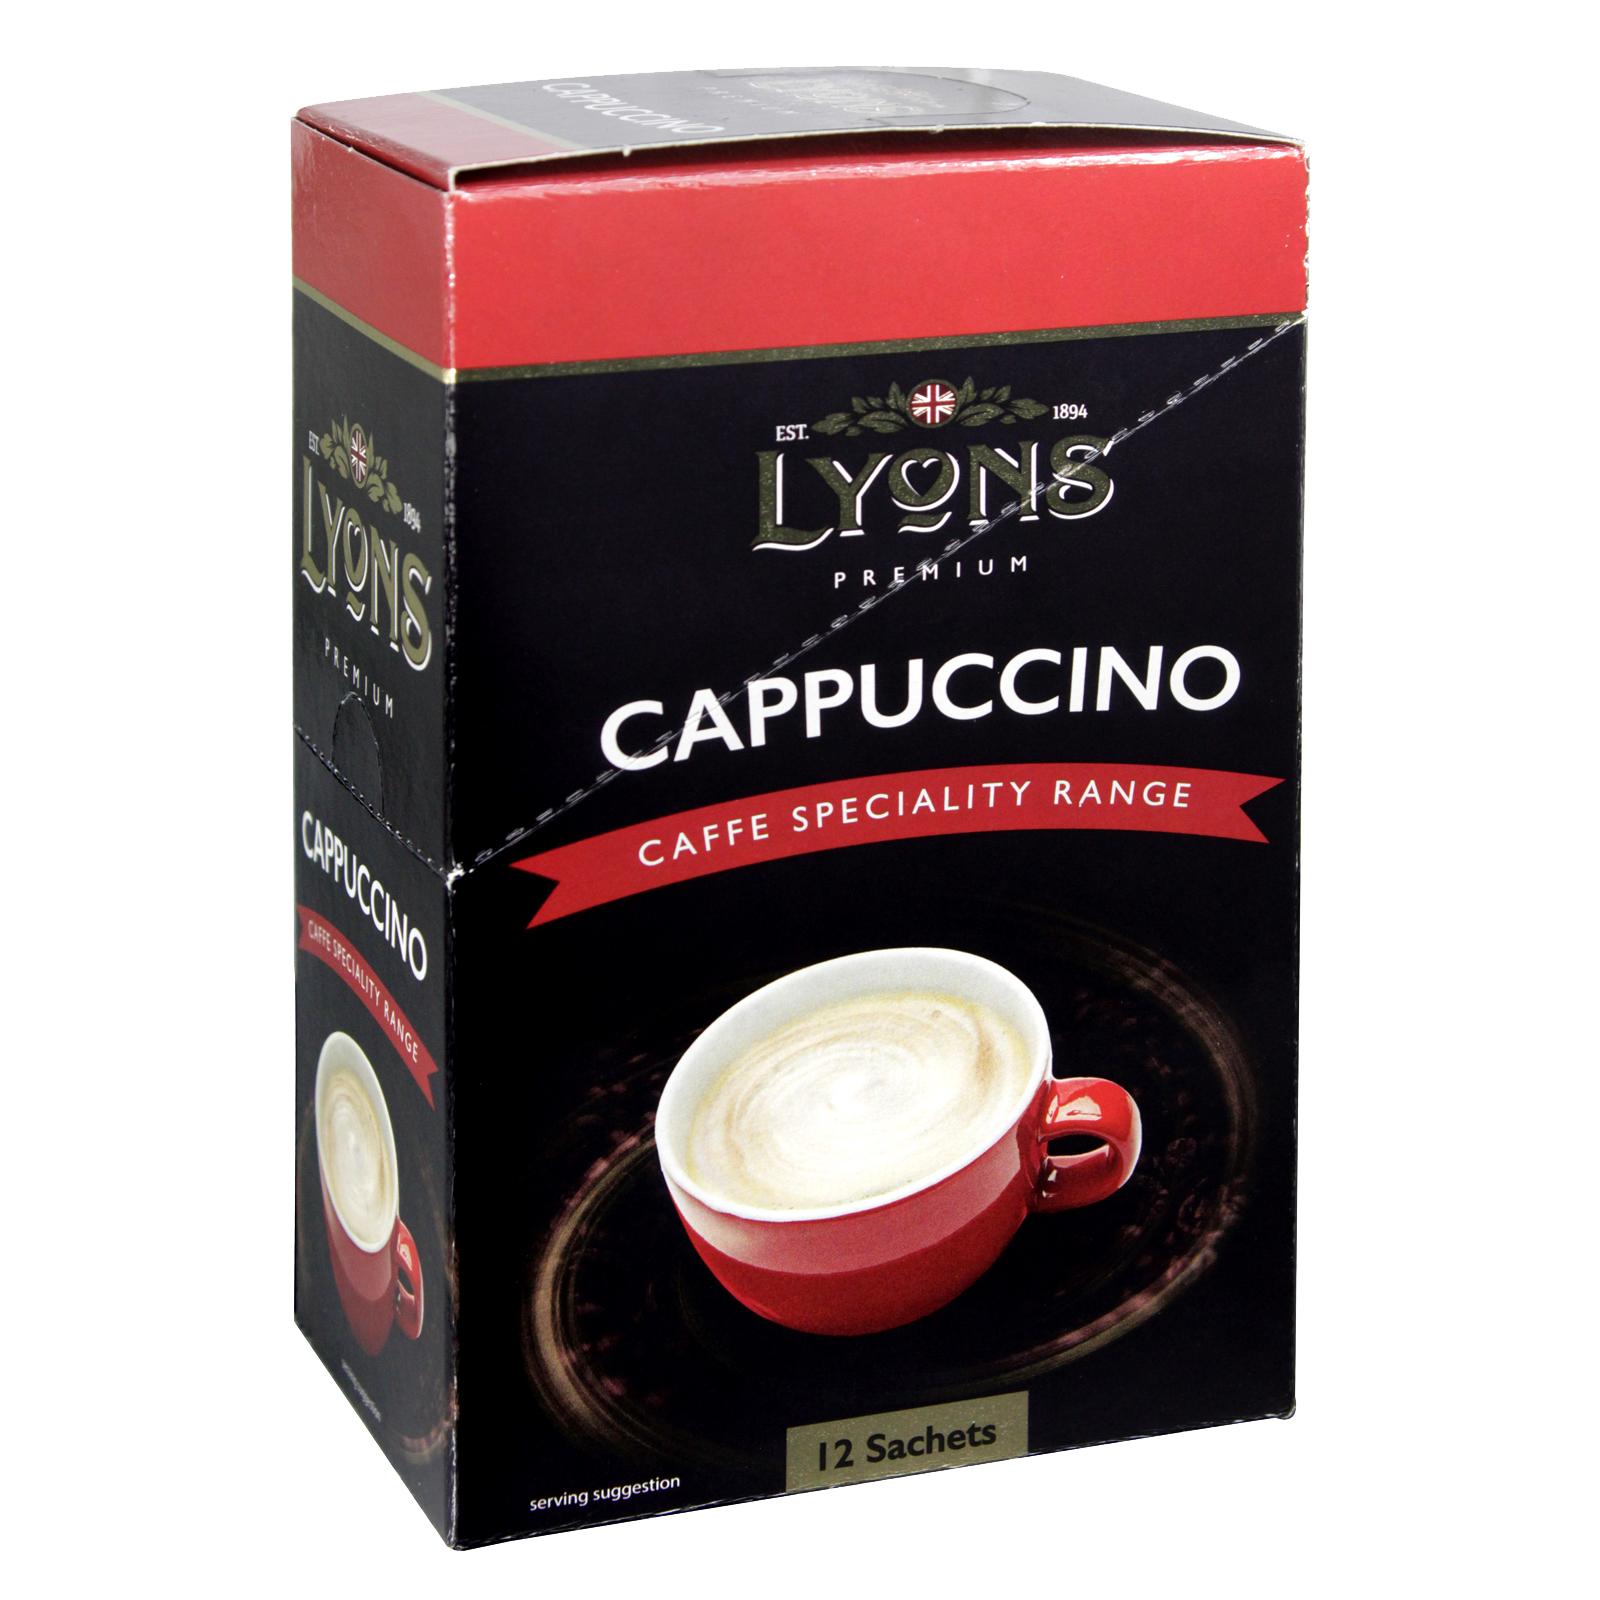 LYONS CAFFE SPECIALITY RANGE CAPPUCCINO 12 SACHETS X20